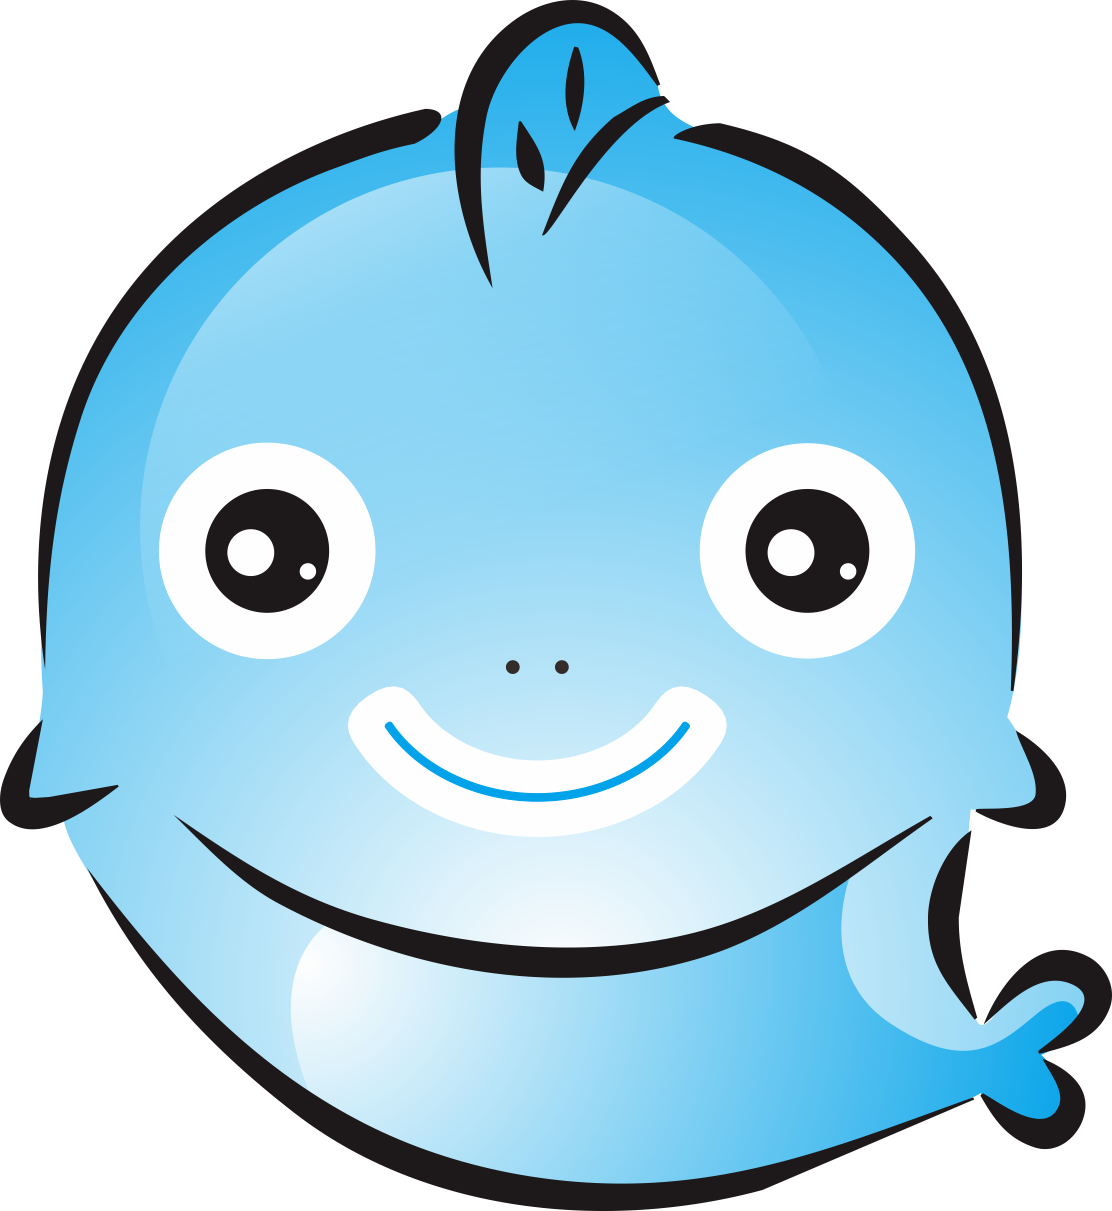 Fish Fun Stock Illustration - Download Image Now - iStock